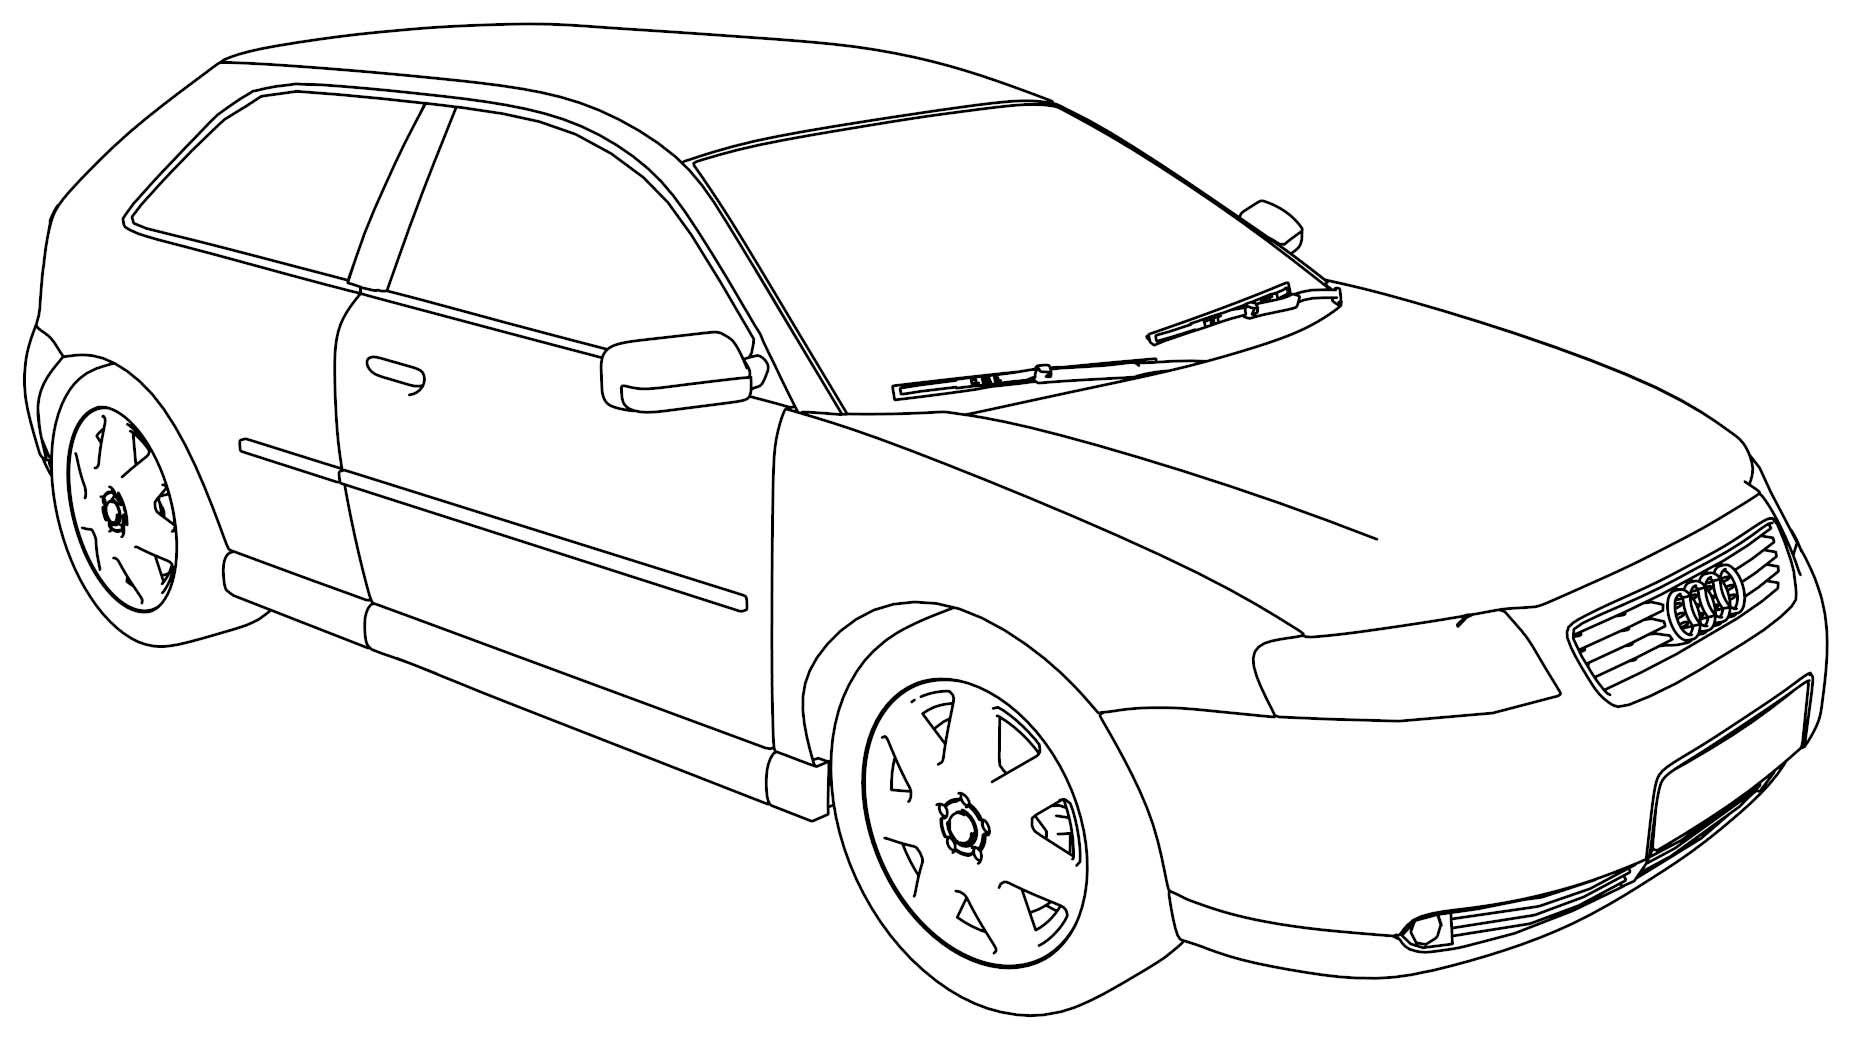 Audi A6 Avant Sketch Coloring Page